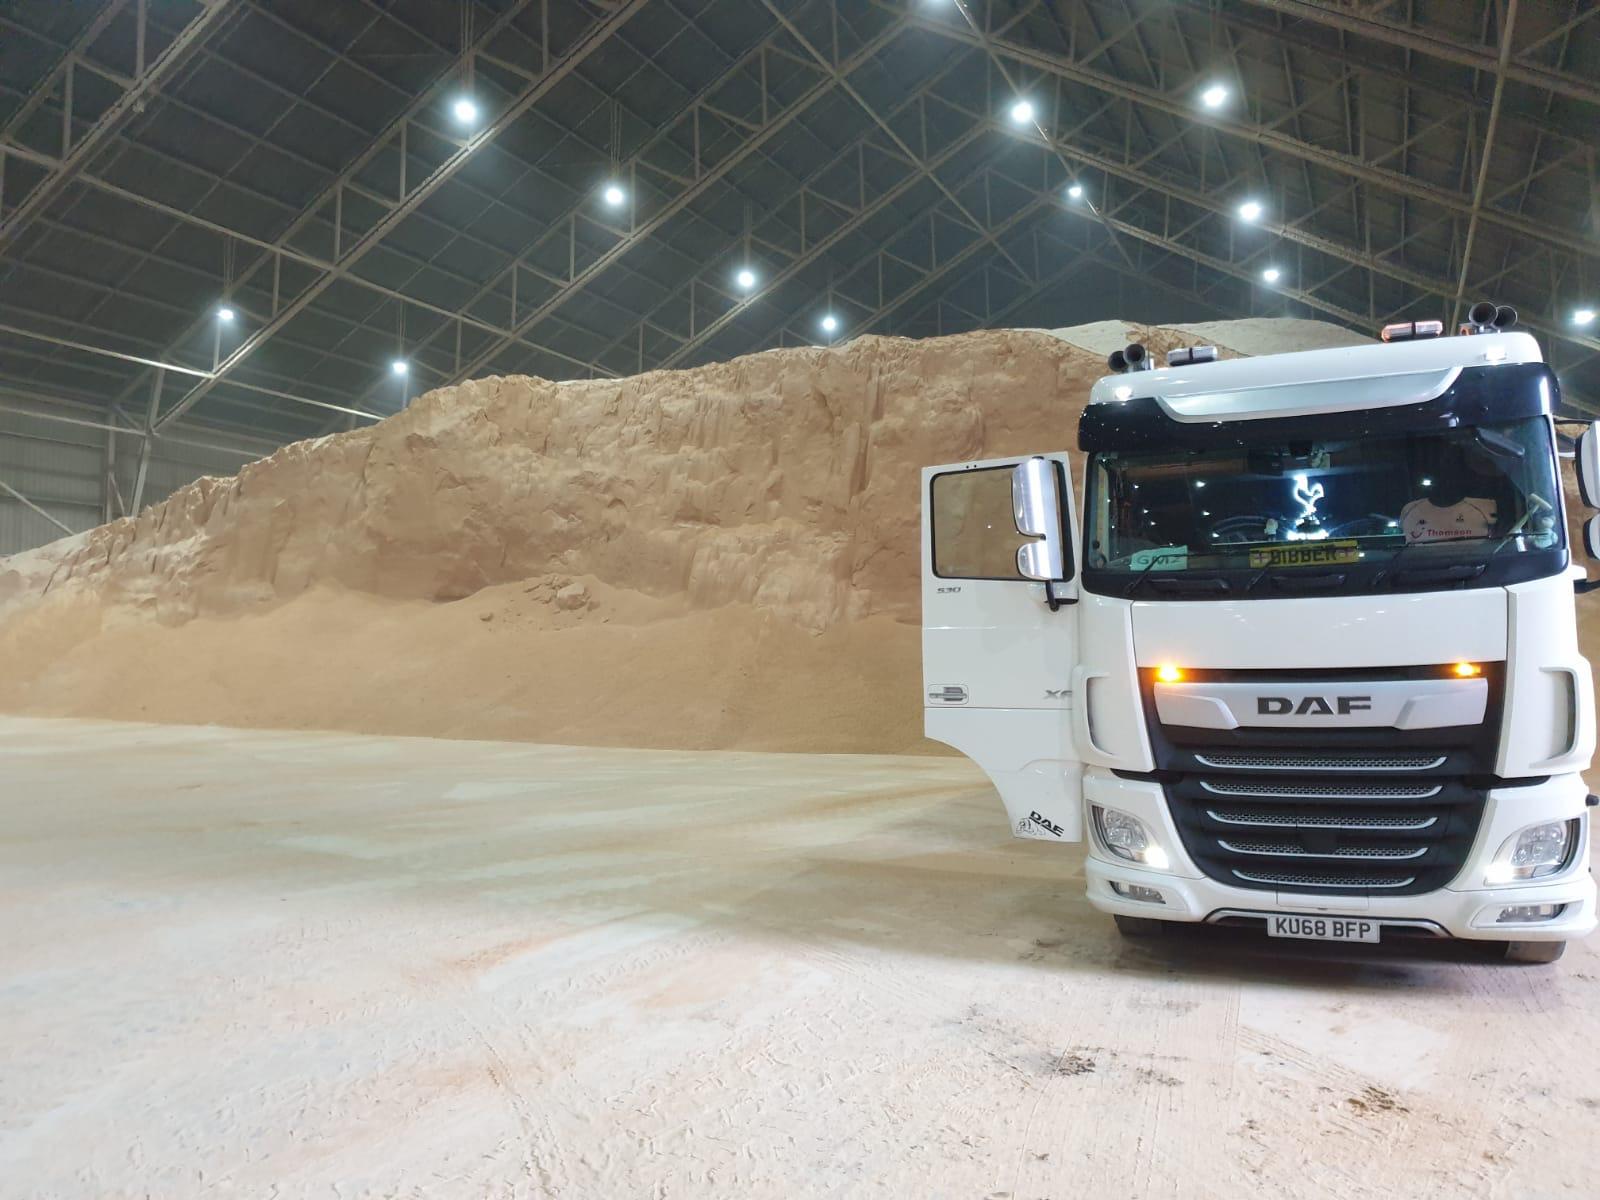 DAF Truck, part of the Hopcrofts Transport fleet